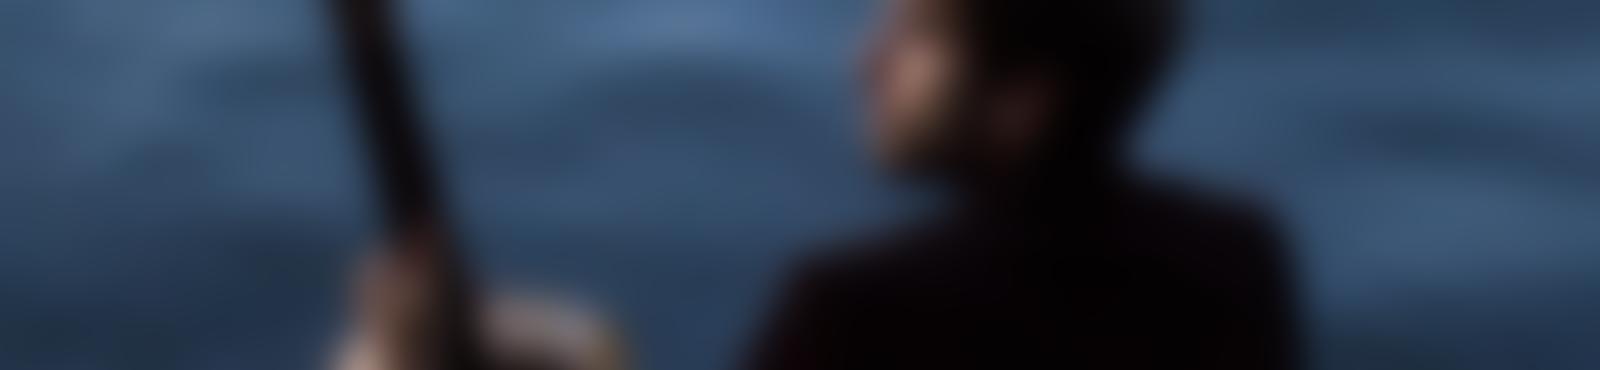 Blurred 6a938c65 25b7 4cd8 a3ff dc0470628515